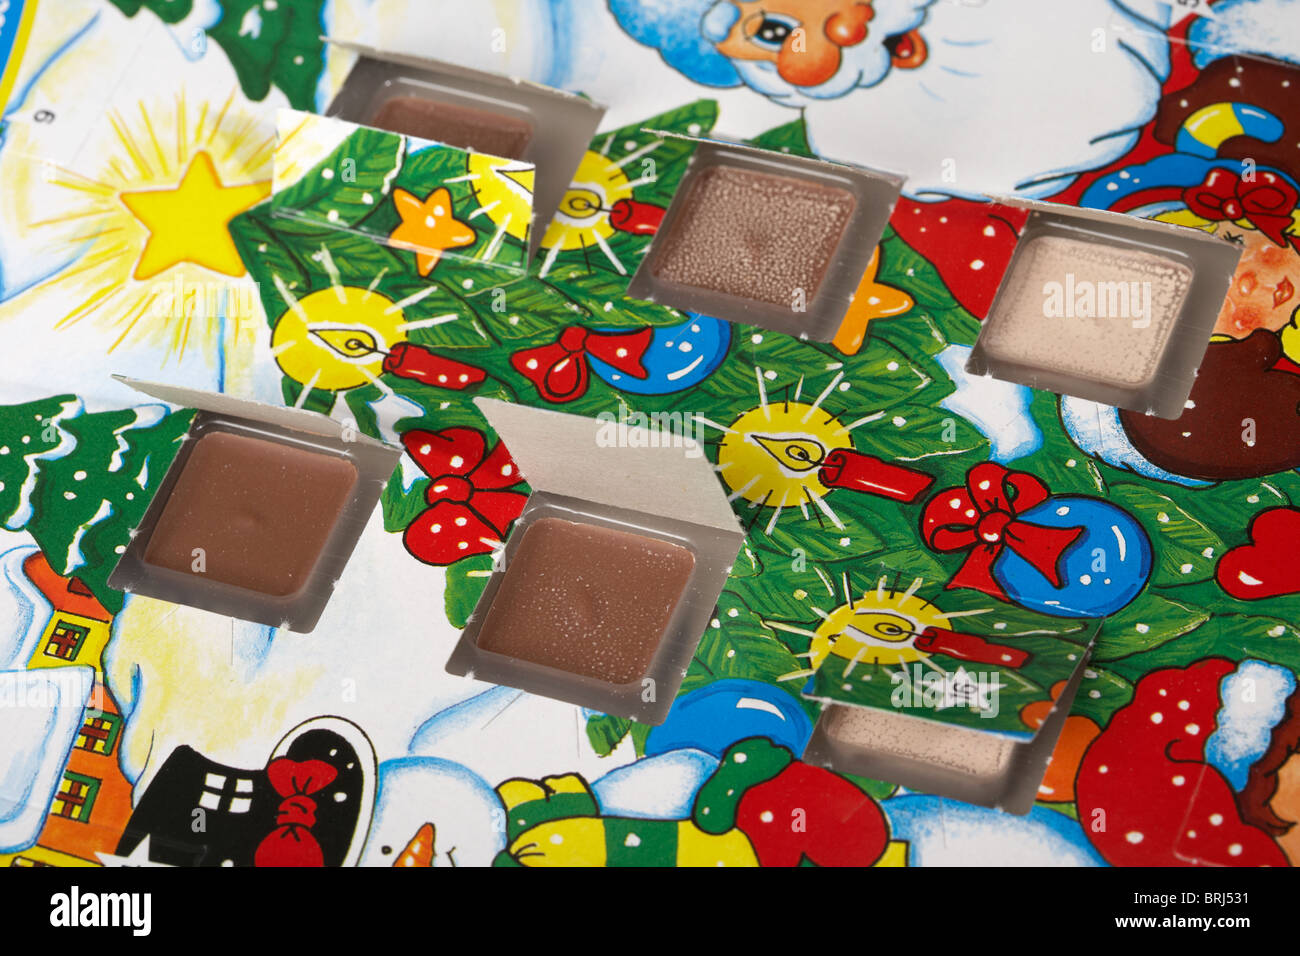 Toy story 4 ADVENT CALENDAR 24 fenêtres remplies avec du Chocolat Treats